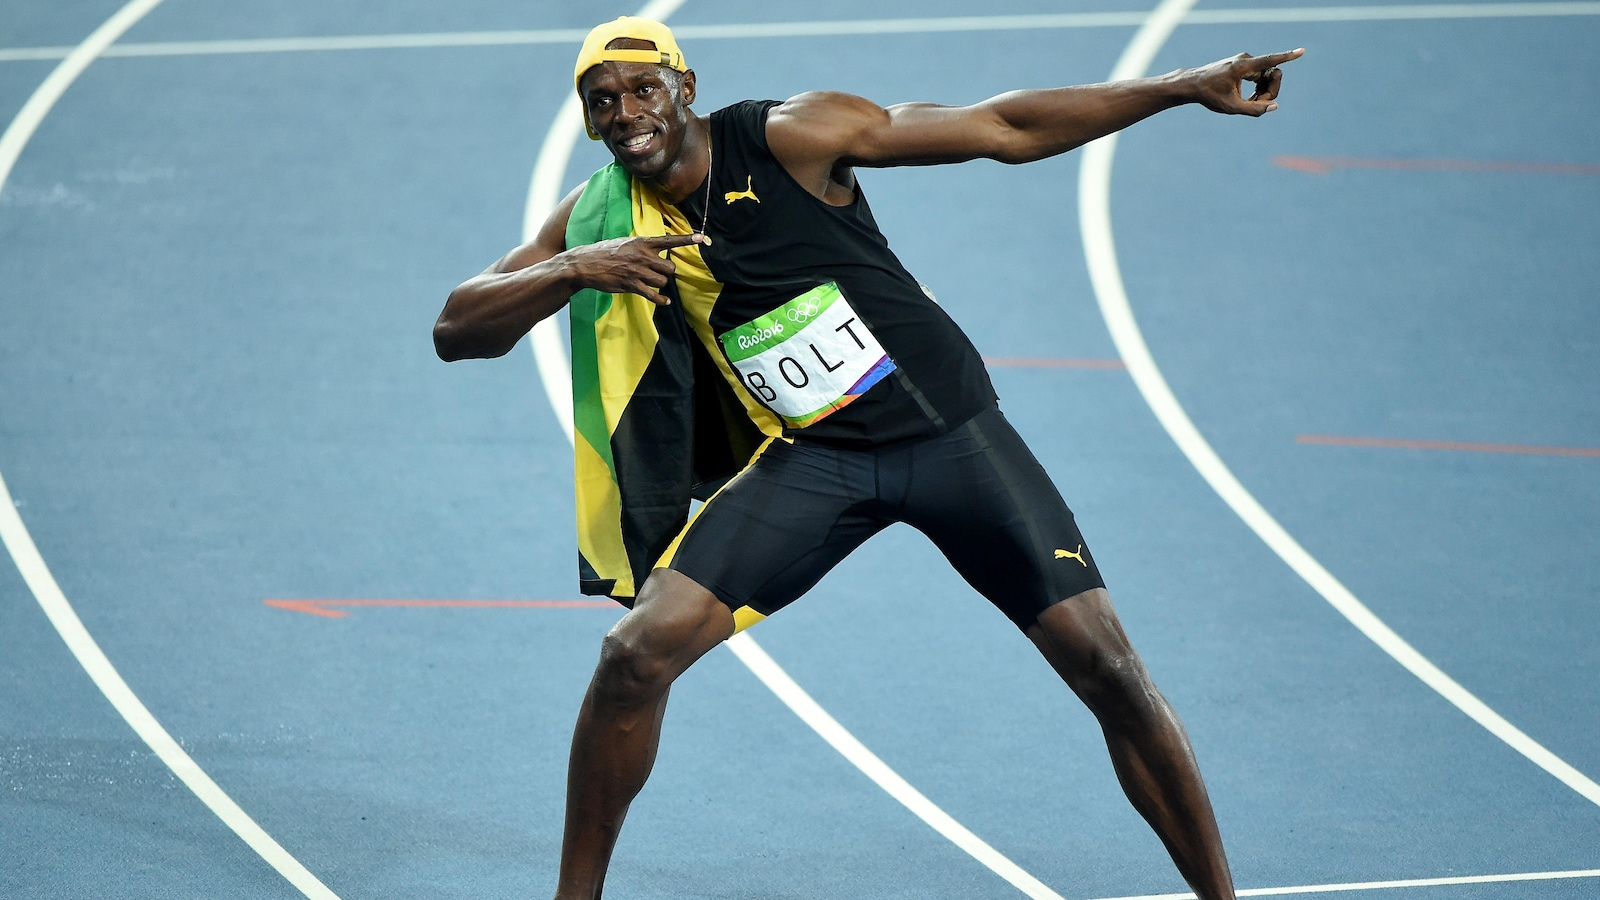 Mondiaux 2017: Usain Bolt termine 3e de son dernier 100 m